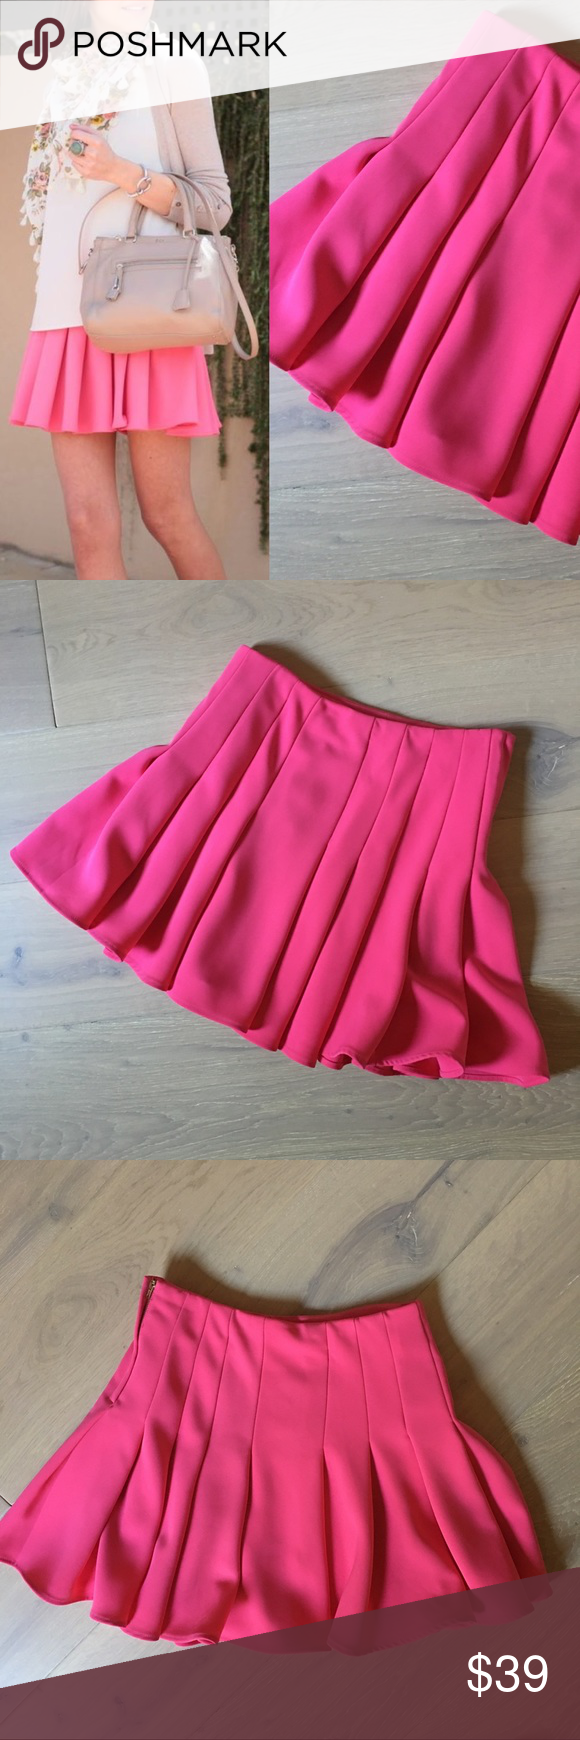 H&m pink pleated dress  Bright Pink  Fuchsia Pleated Skirt   Pink pleated skirt Bright